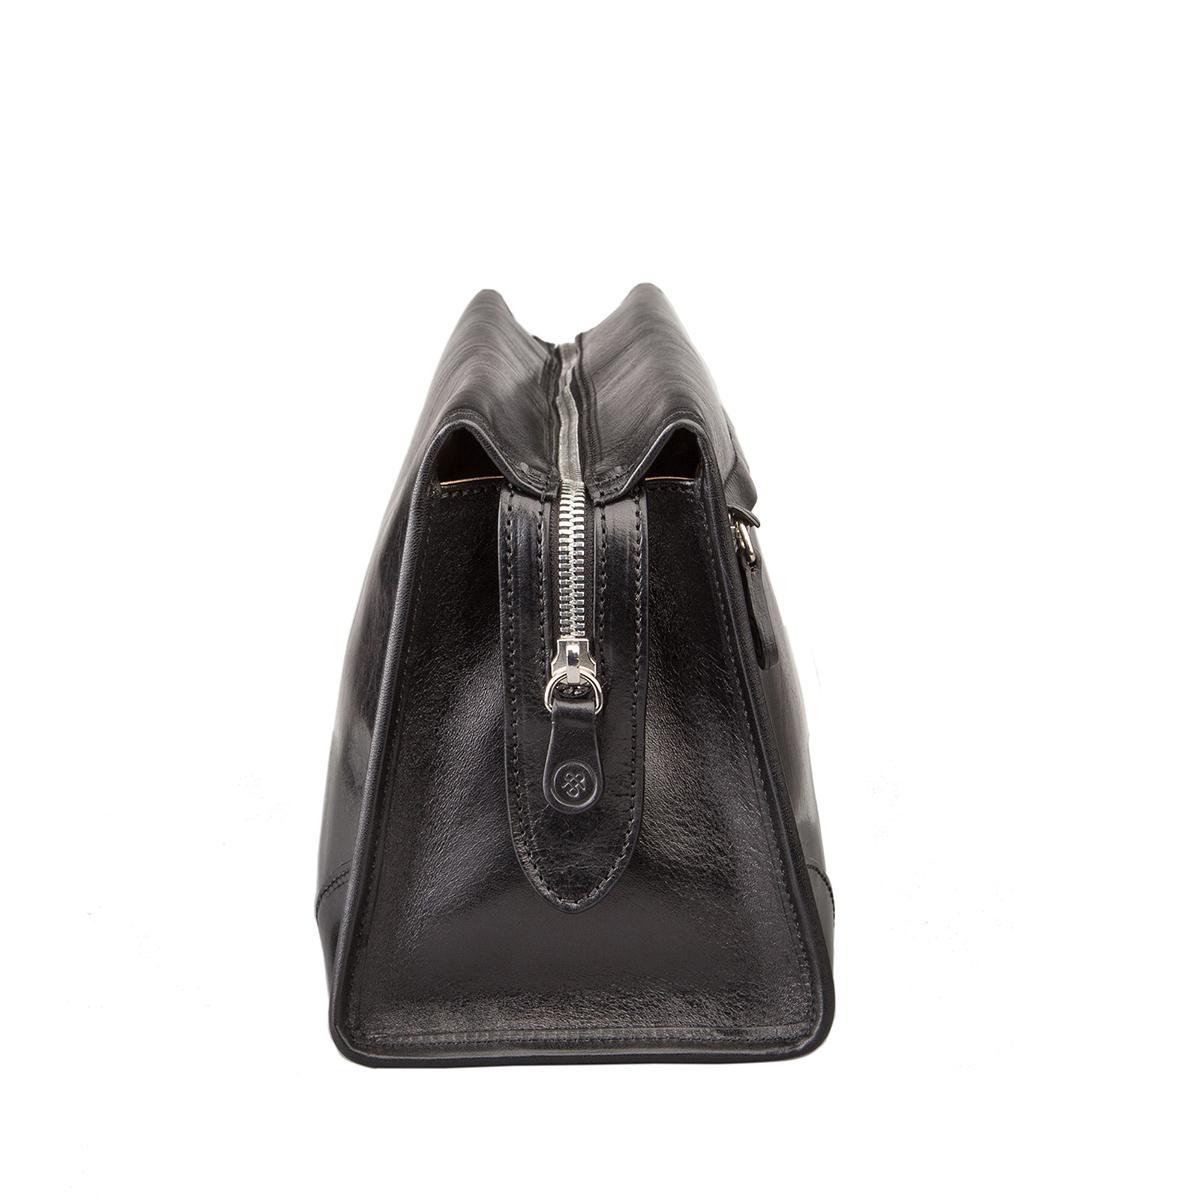 maxwell scott bags luxus herren kulturbeutel aus leder in schwarz tanta. Black Bedroom Furniture Sets. Home Design Ideas